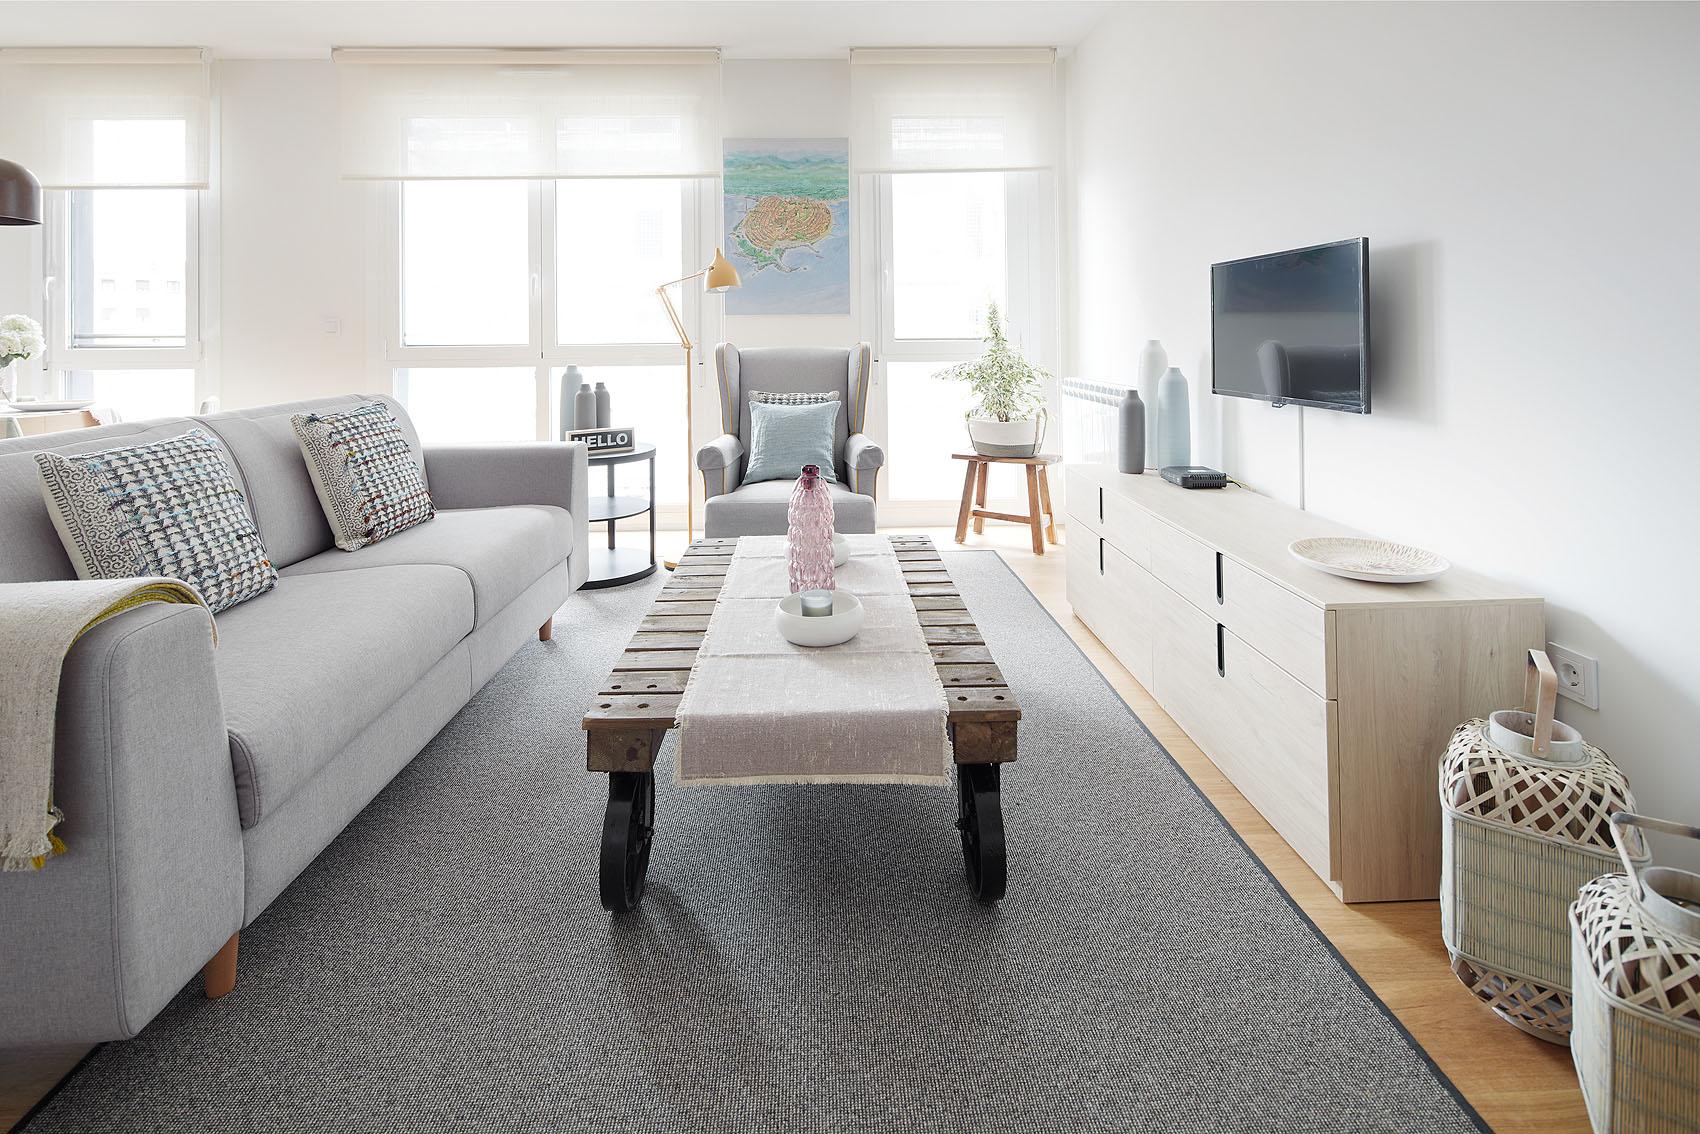 Apartamento Lizarra - Iñaki Caperochipi - Fotografía